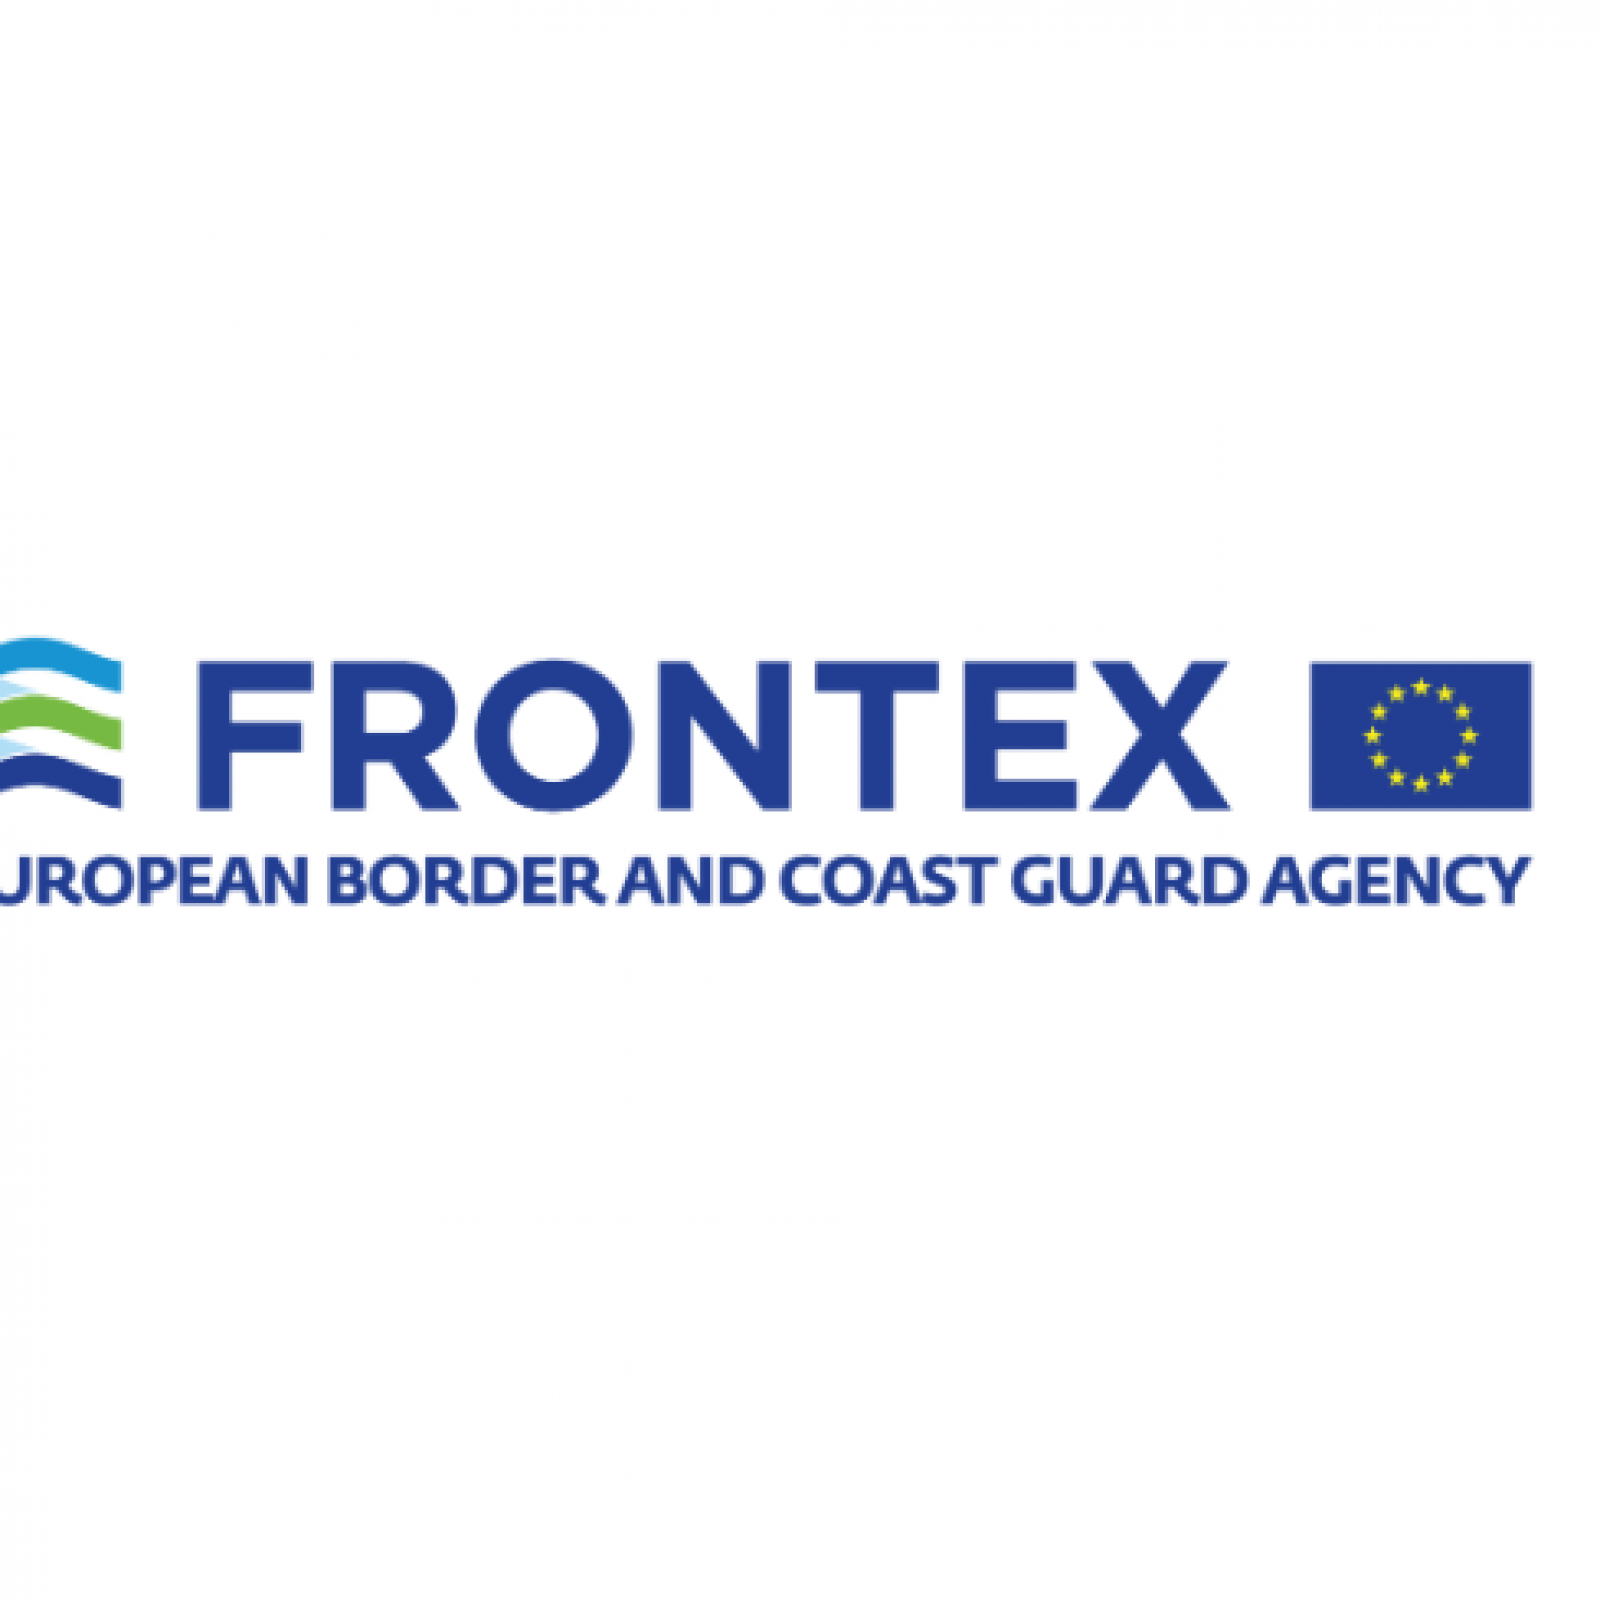 Frontex-logo